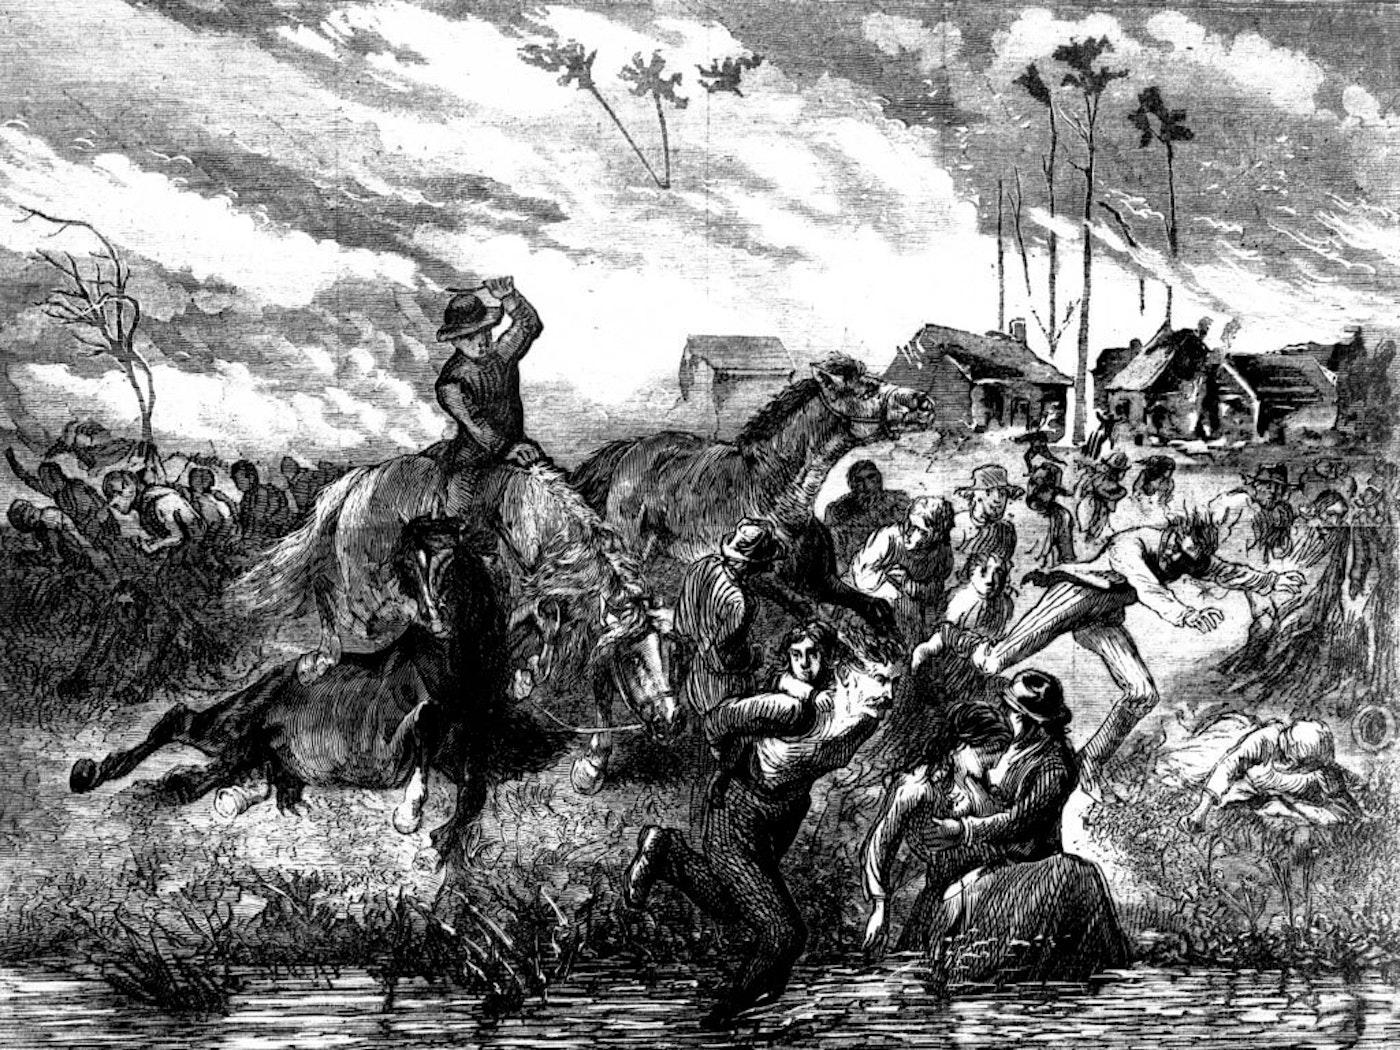 People sought refuge in the ice-cold waters of the Peshtigo River to avoid certain death during the Peshtigo fire in October 1871. (Illustration by GJ Tisdale, via Peshtigo Fire Museum)